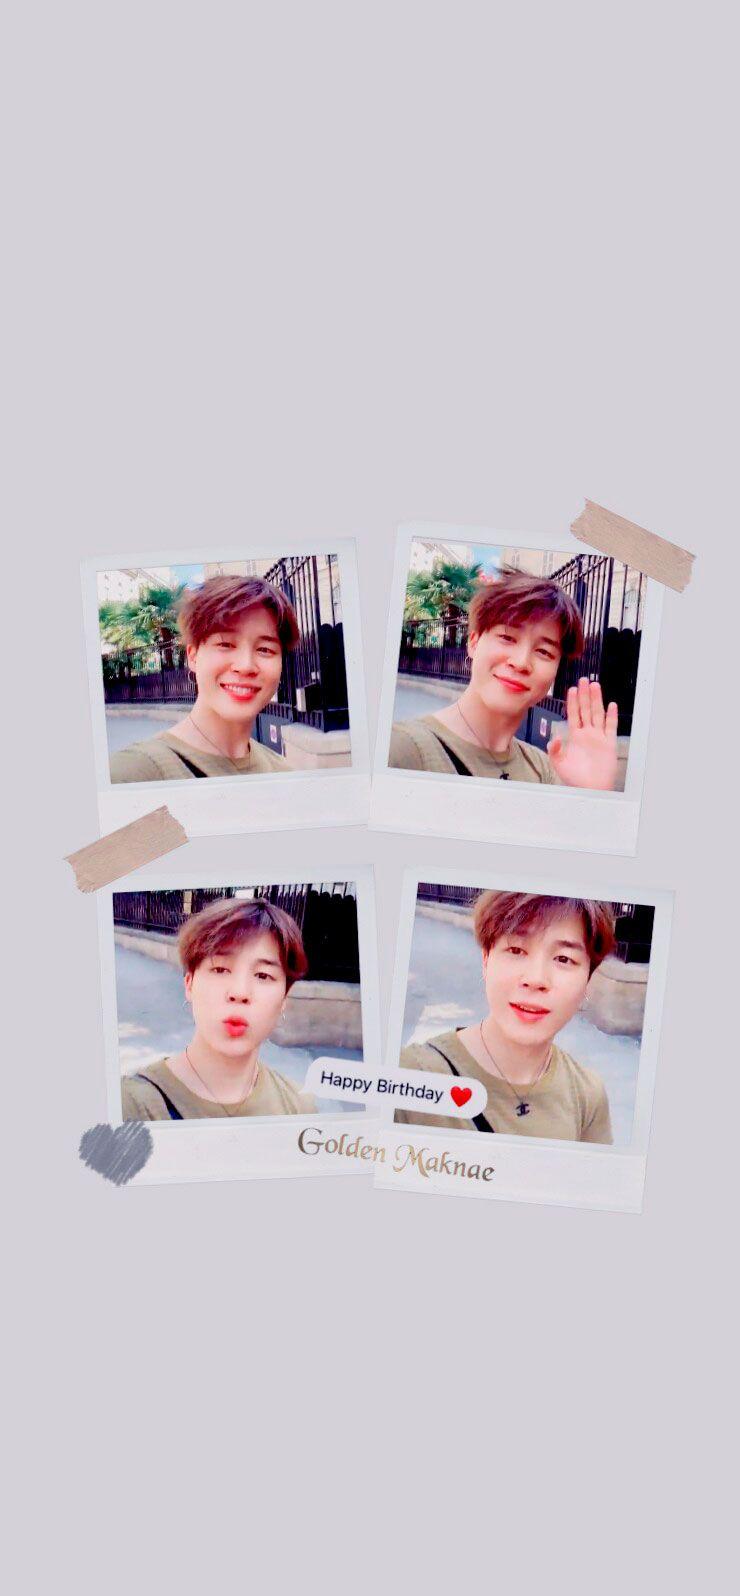 #JIMIN #HappyBirthdayKookie JIMIN Saying Happy Birthday to Jungkook  cr: hope28 #happybirthdayjungkook